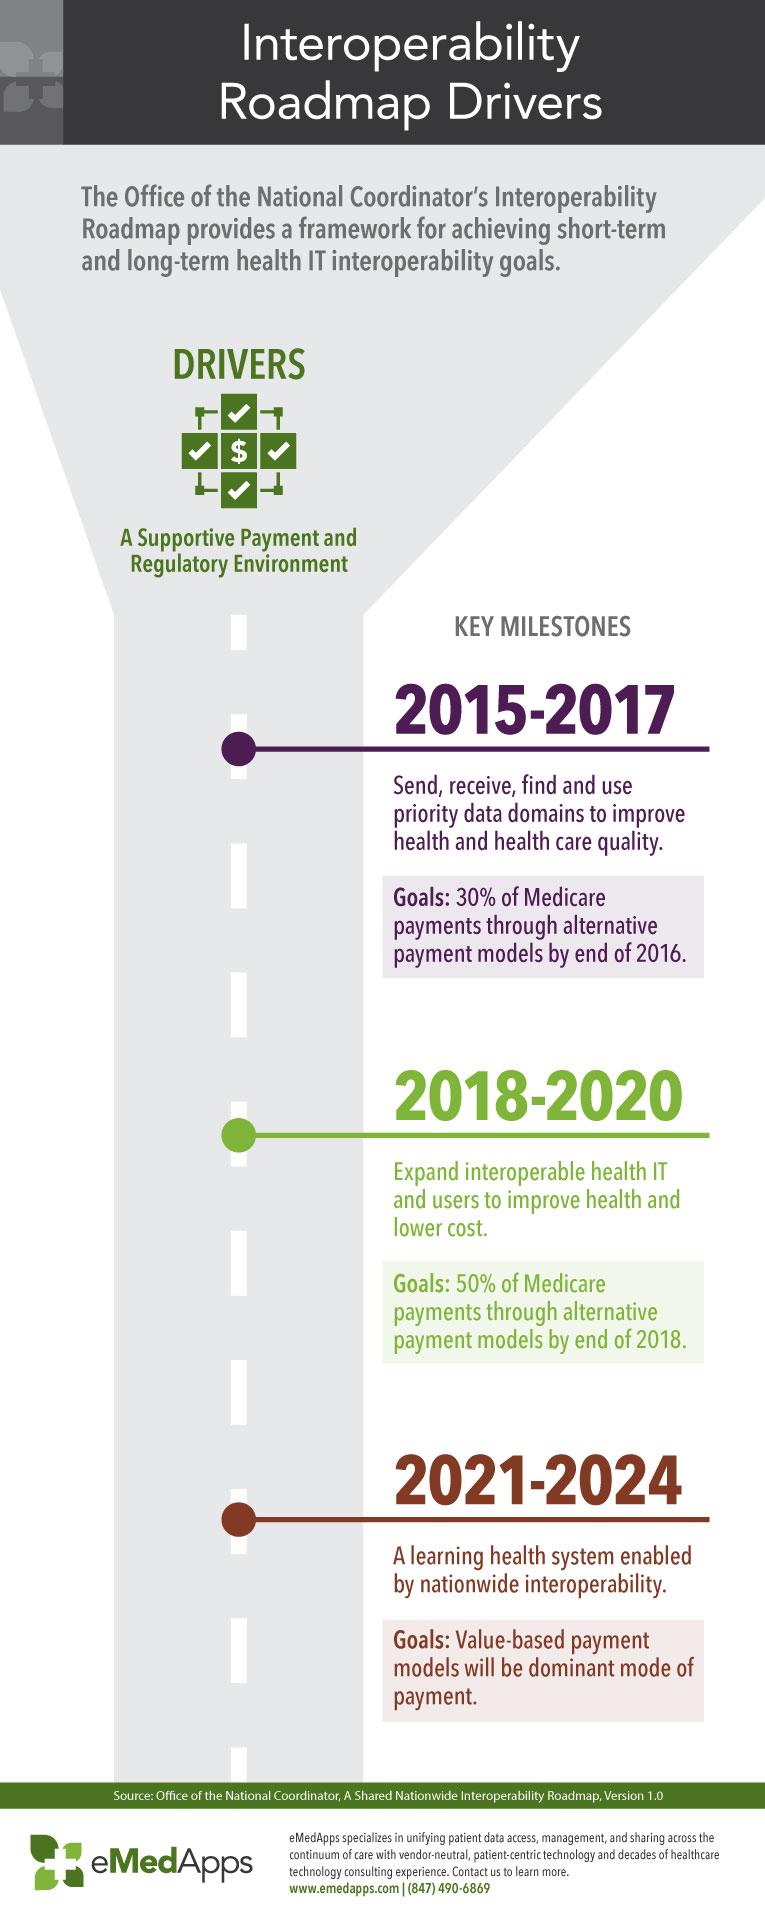 Interoperability Roadmap Drivers Infographic